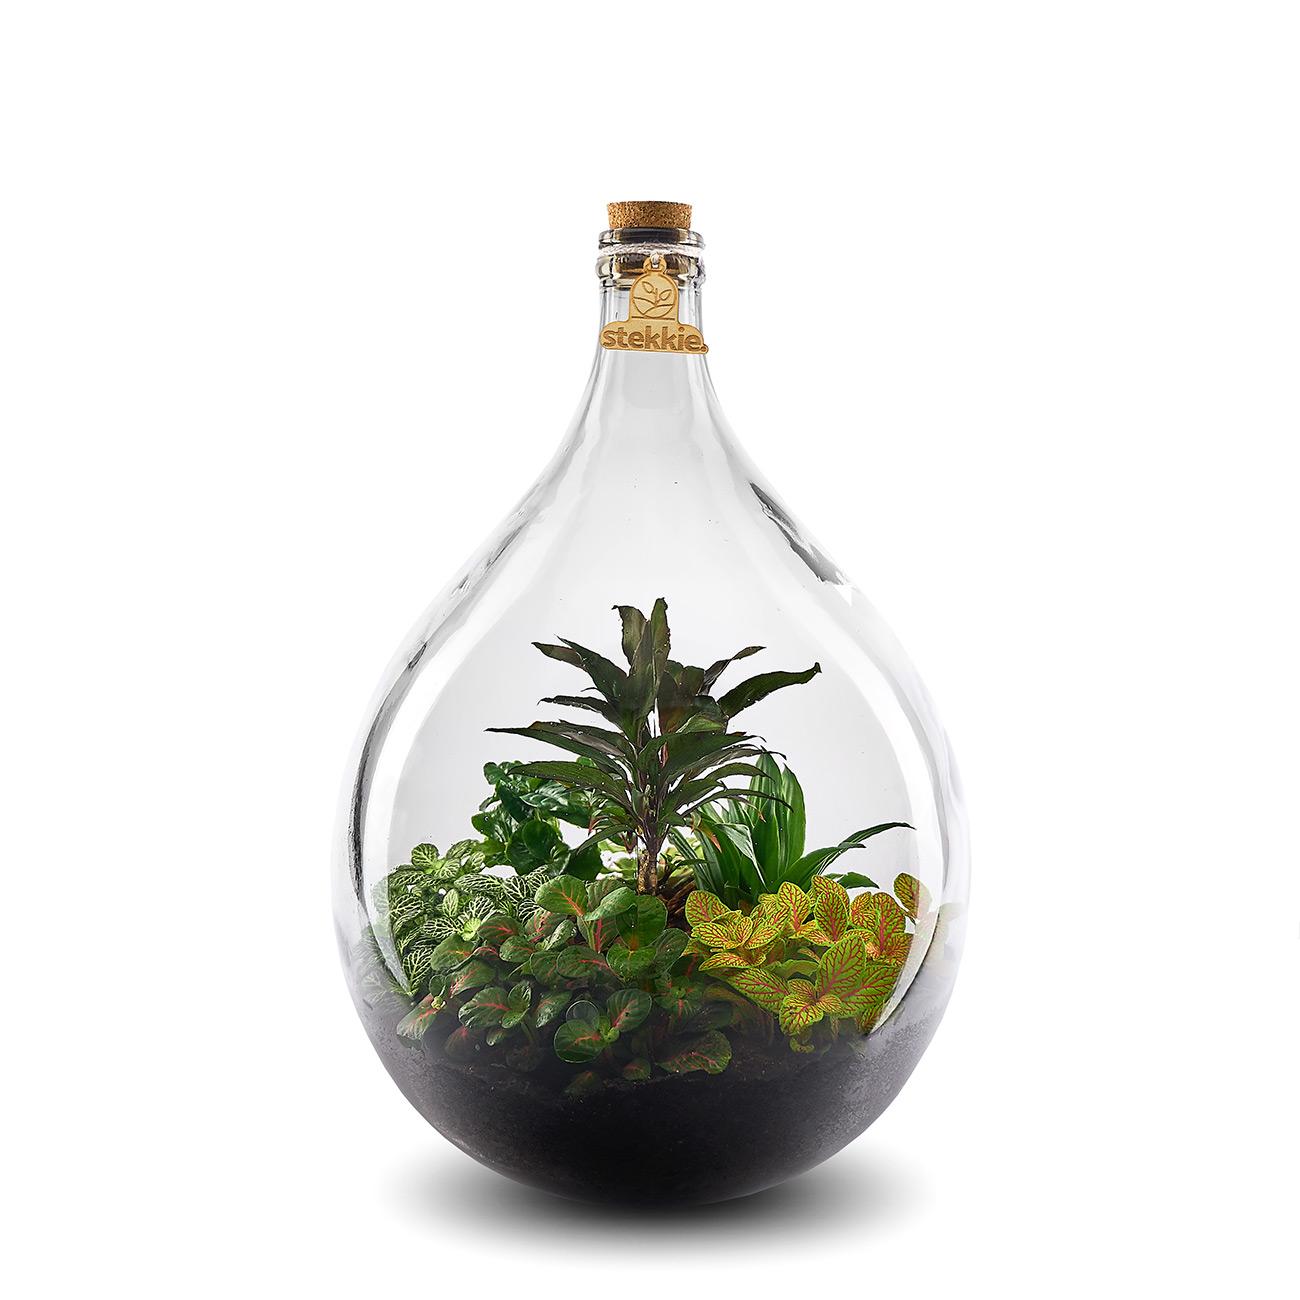 stekkie-large-geel-planten-terrarium